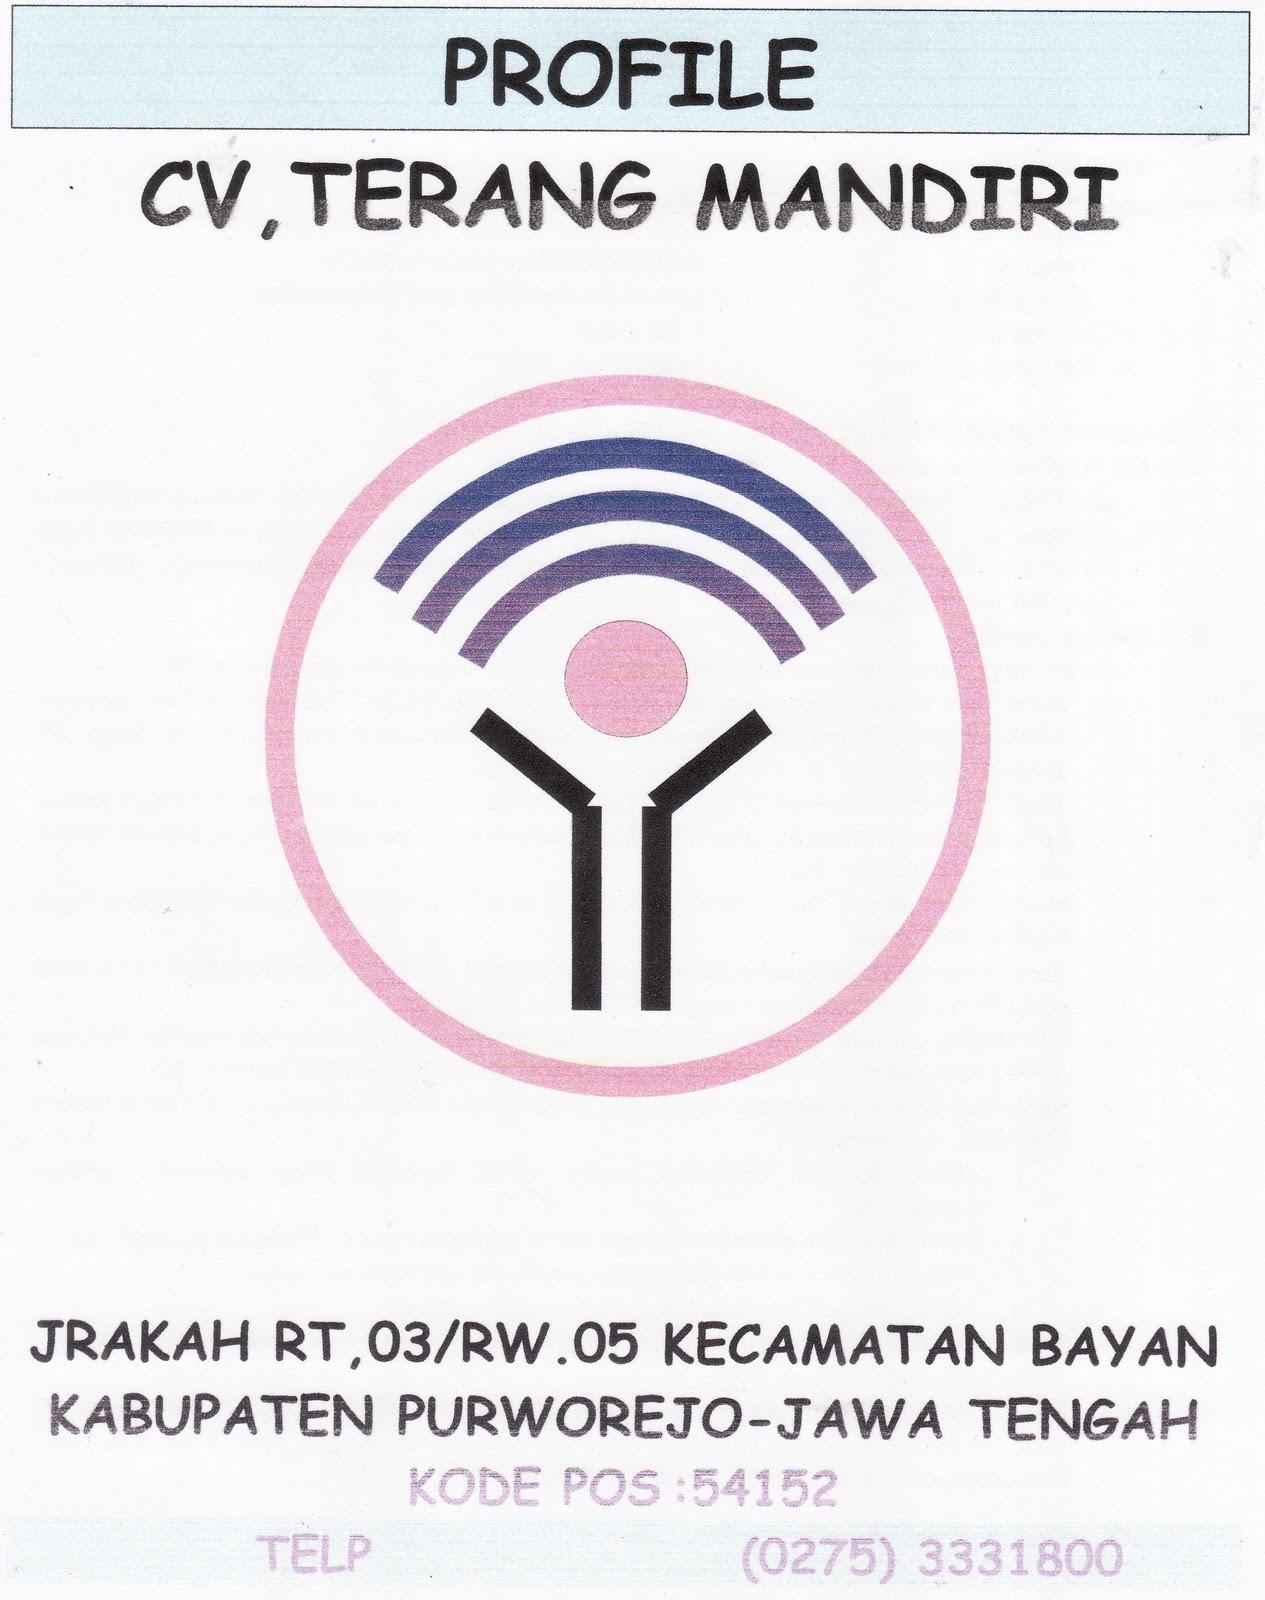 Contoh Company Profile Usaha Dagang Contoh Oi